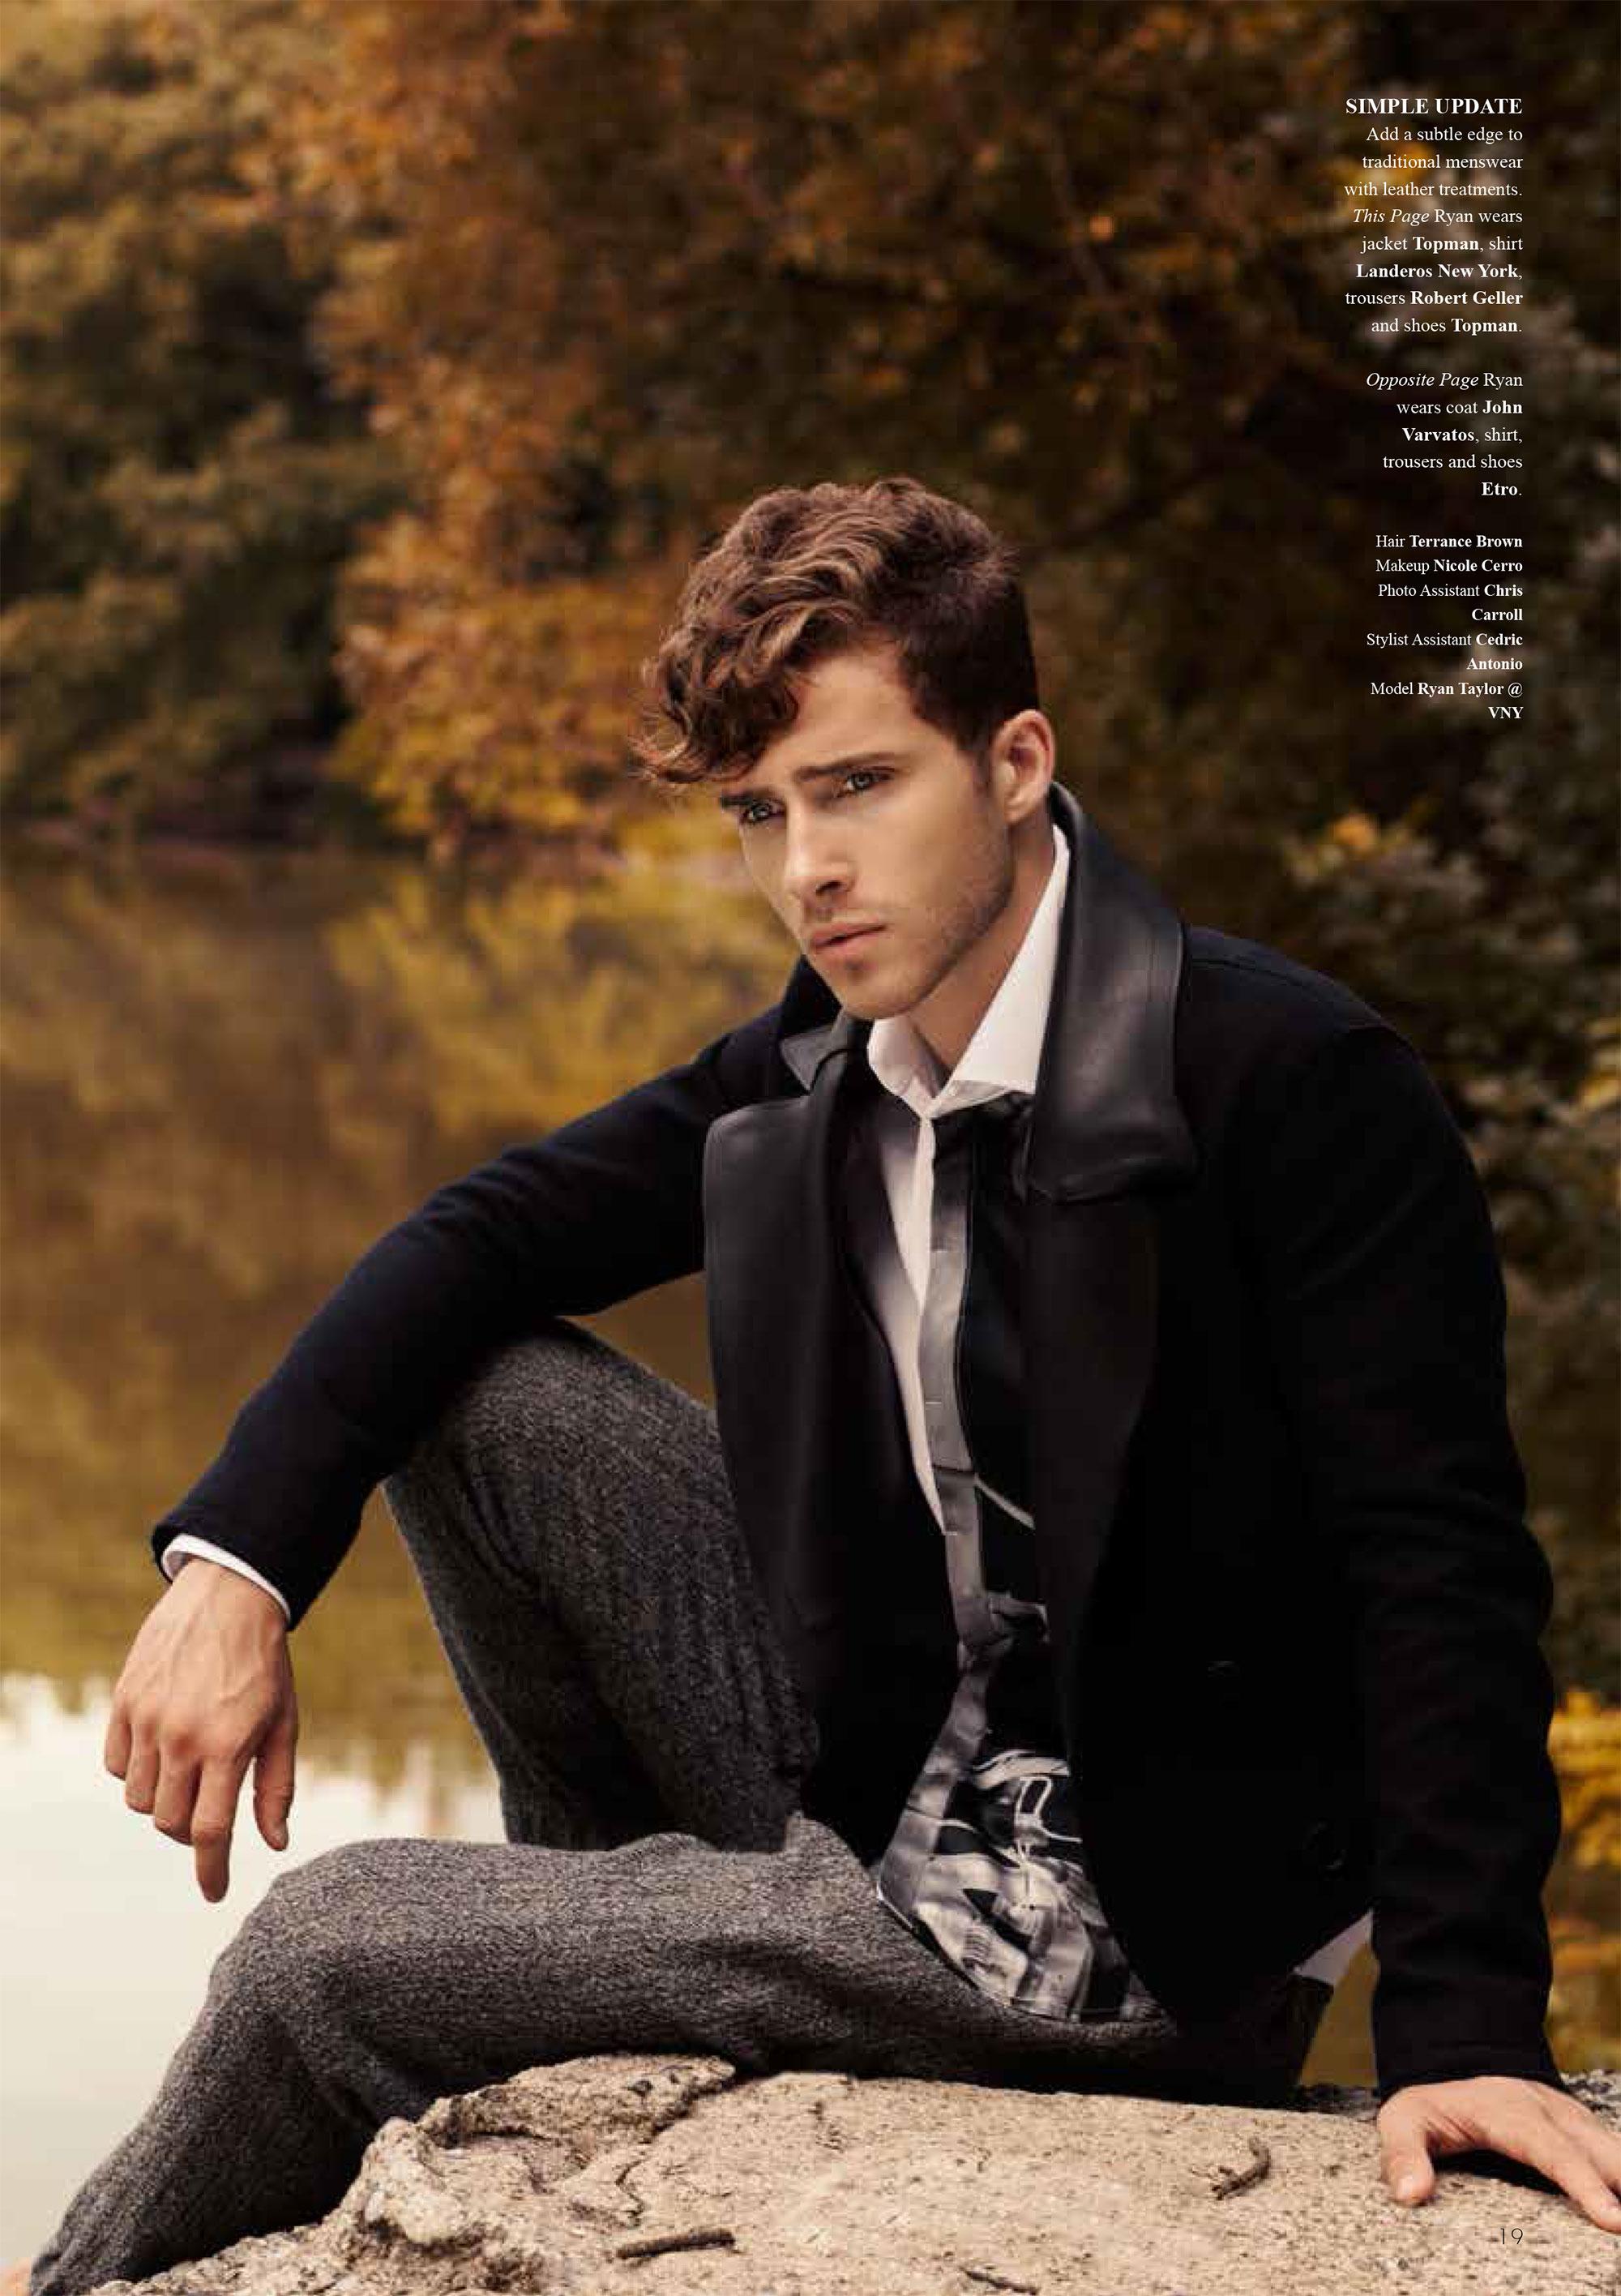 The Fashionisto Magazine 11th Issue